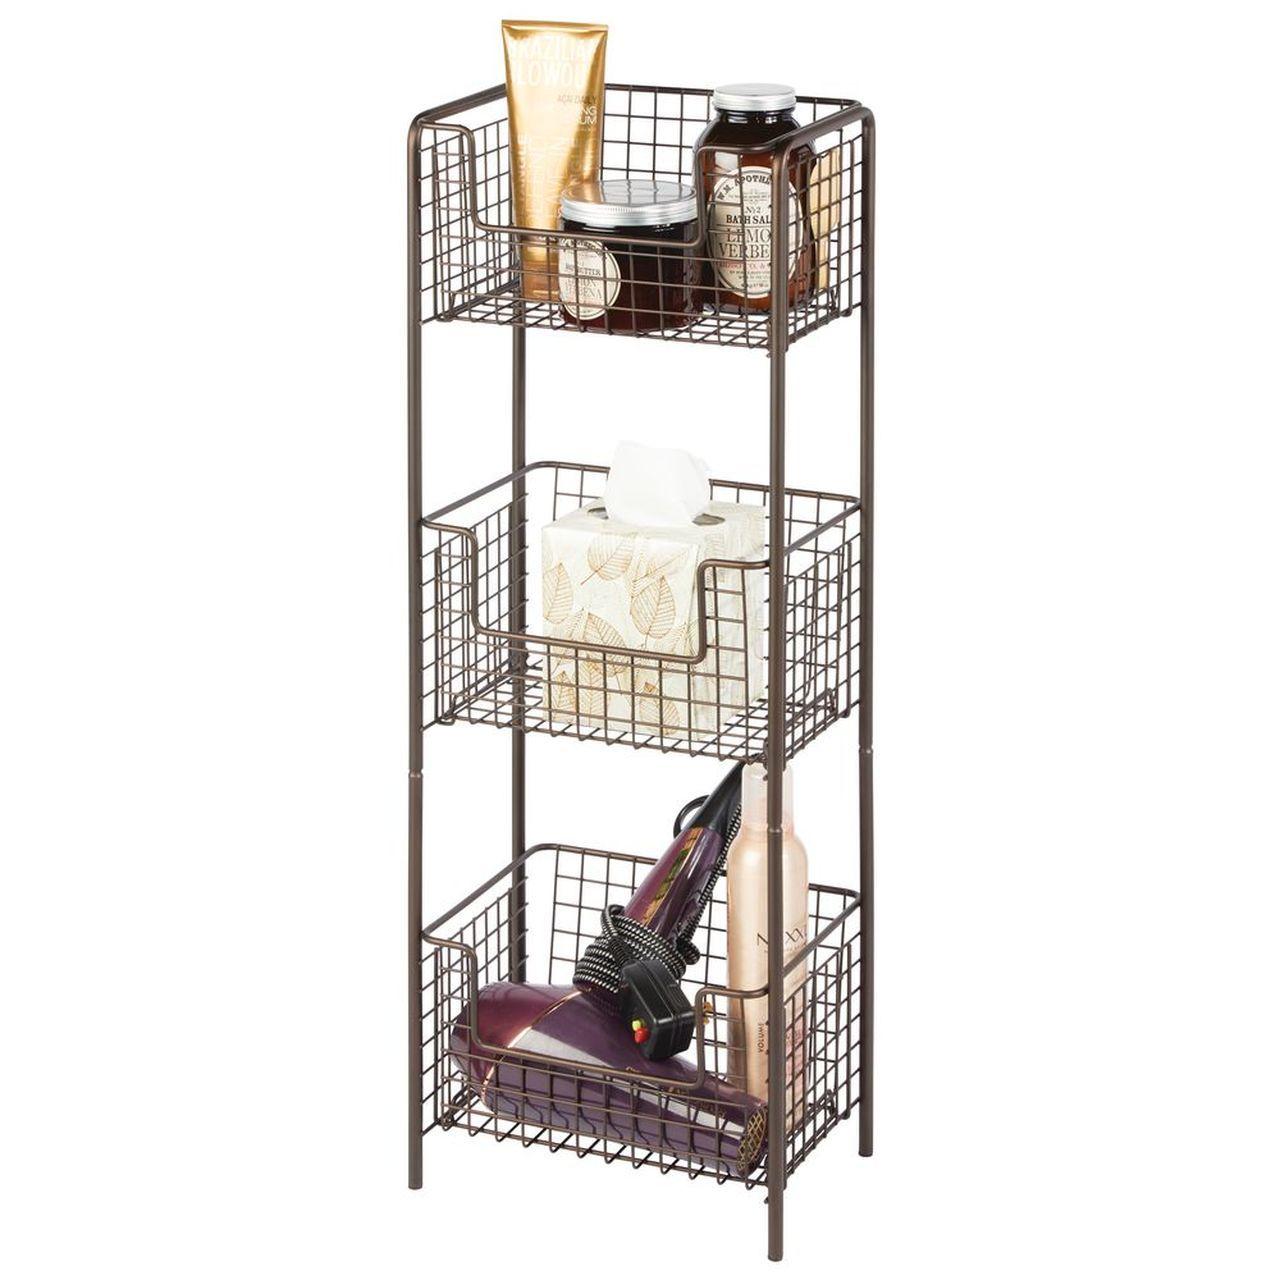 3 Tier Wire Free Standing Bathroom Storage Shelf Bathroom Shelving Unit Bathroom Storage Shelves Storage Shelves